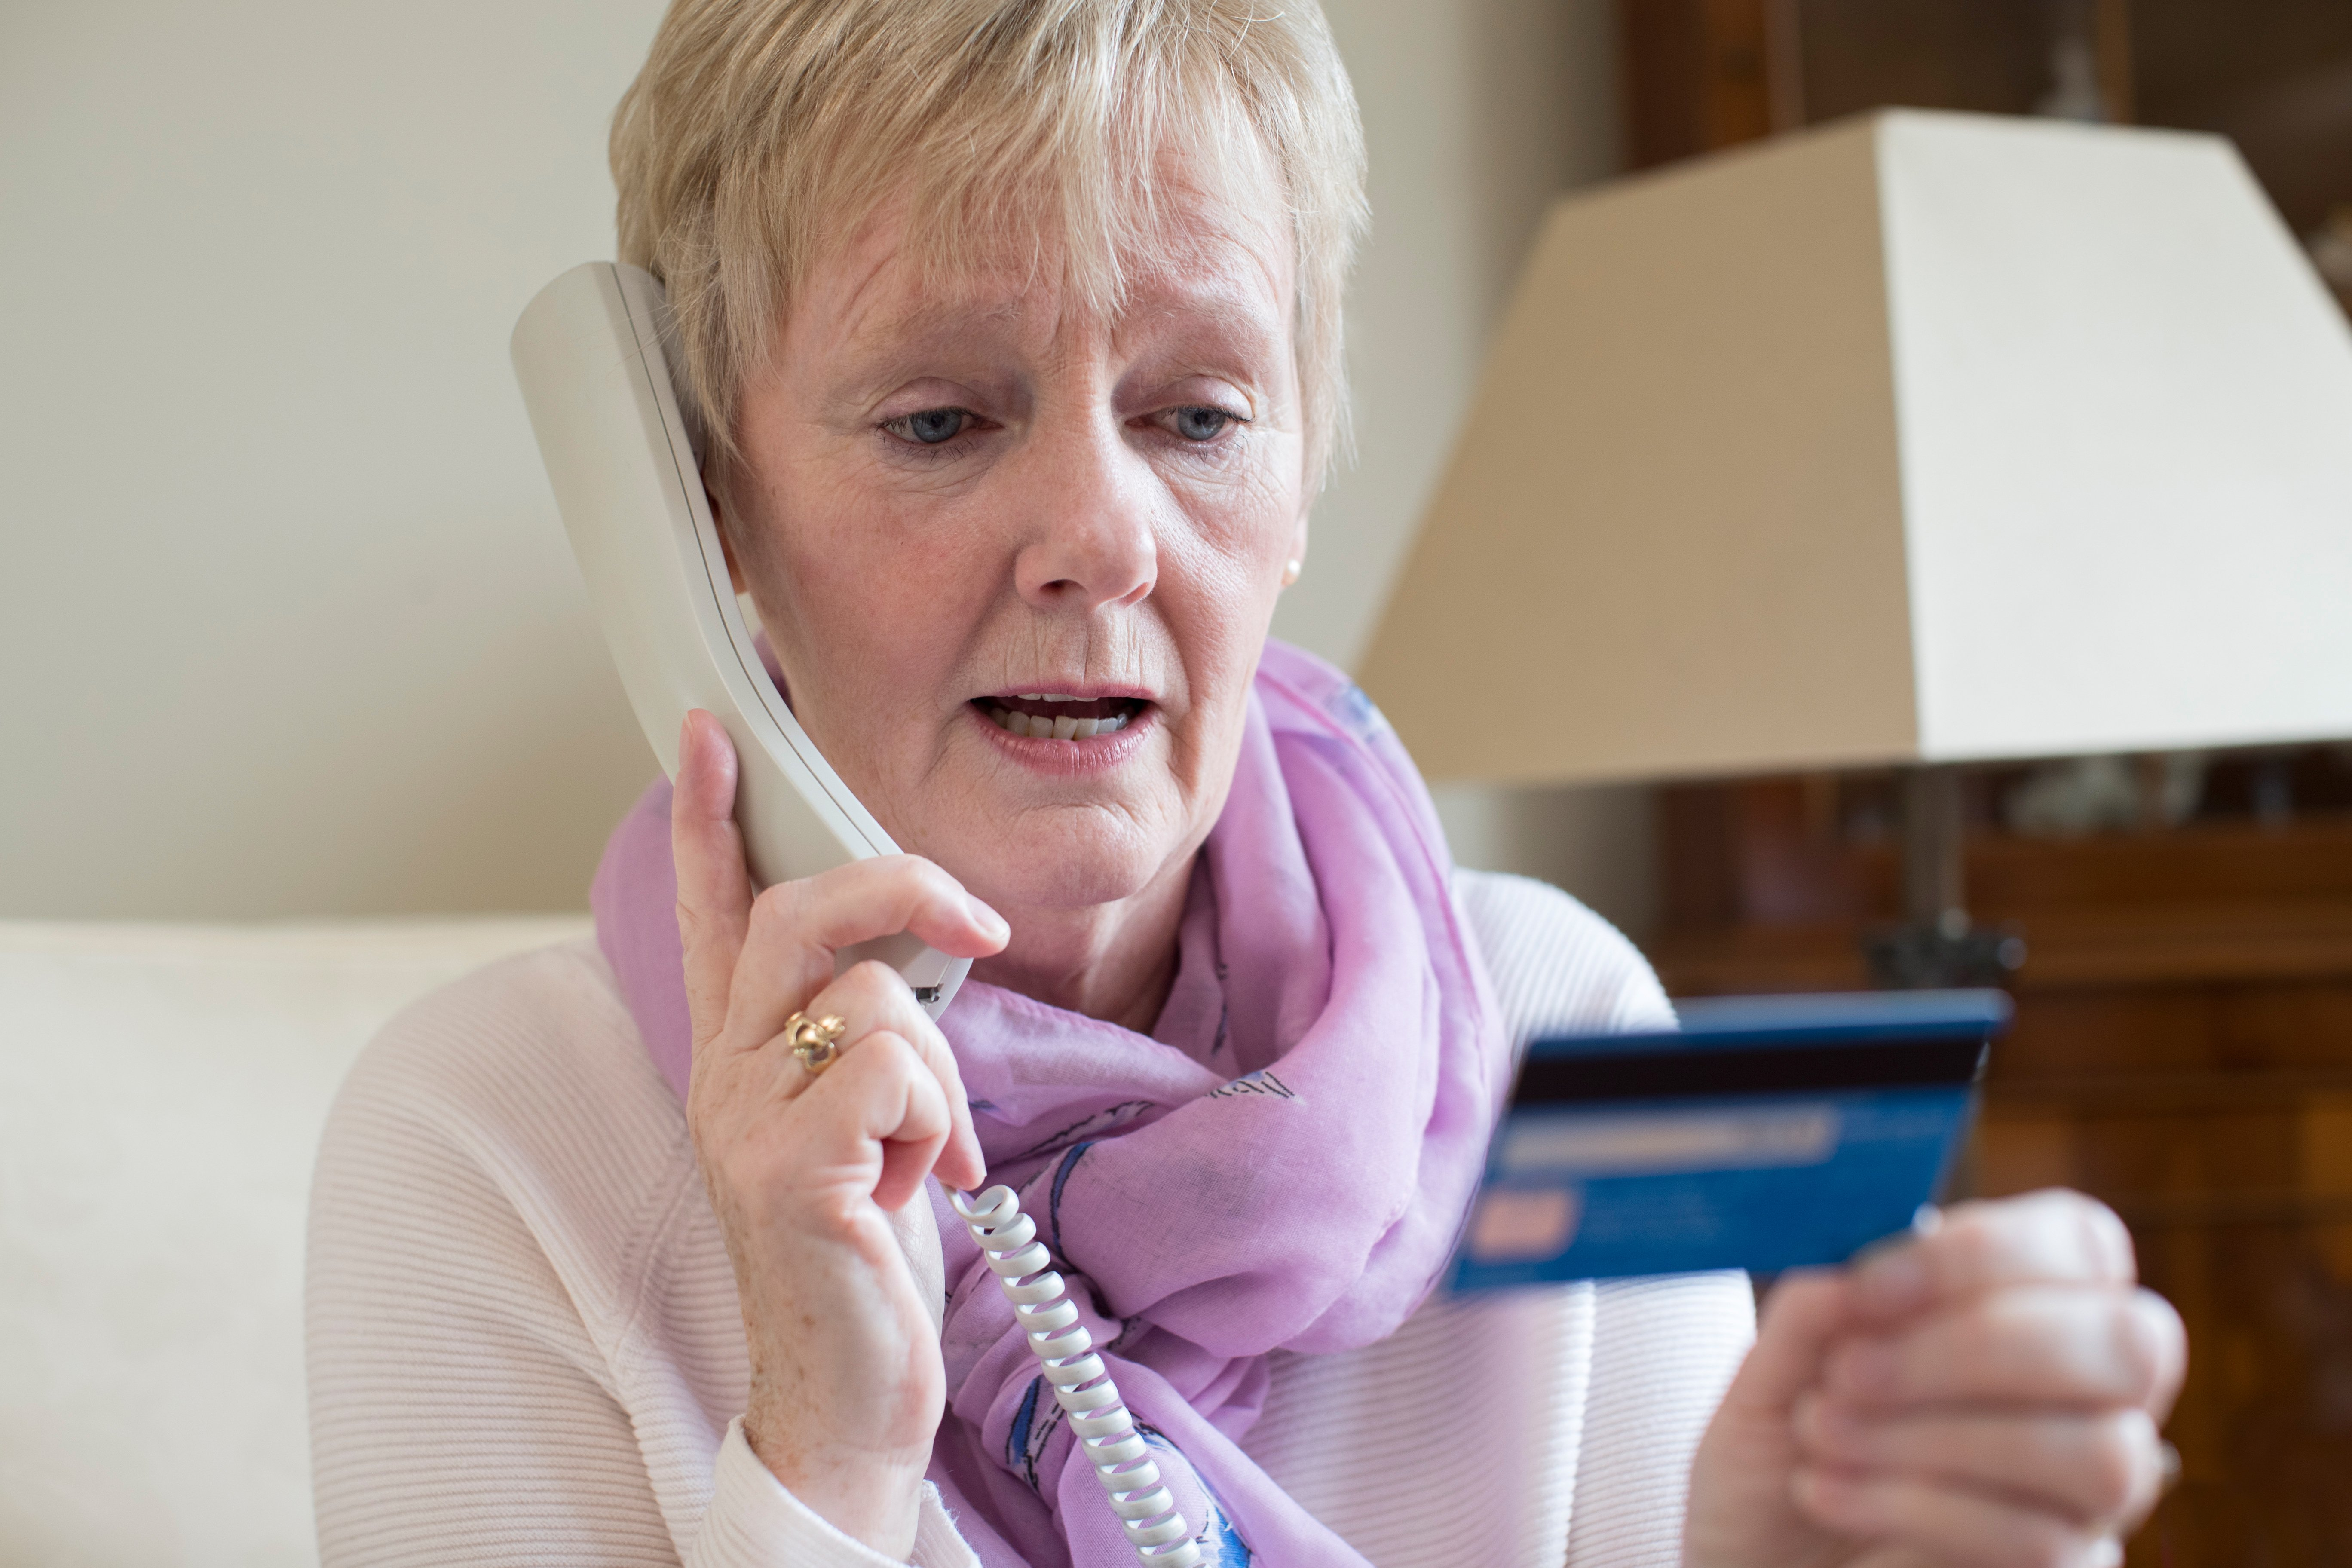 3 Popular Financial Scams That Target Seniors